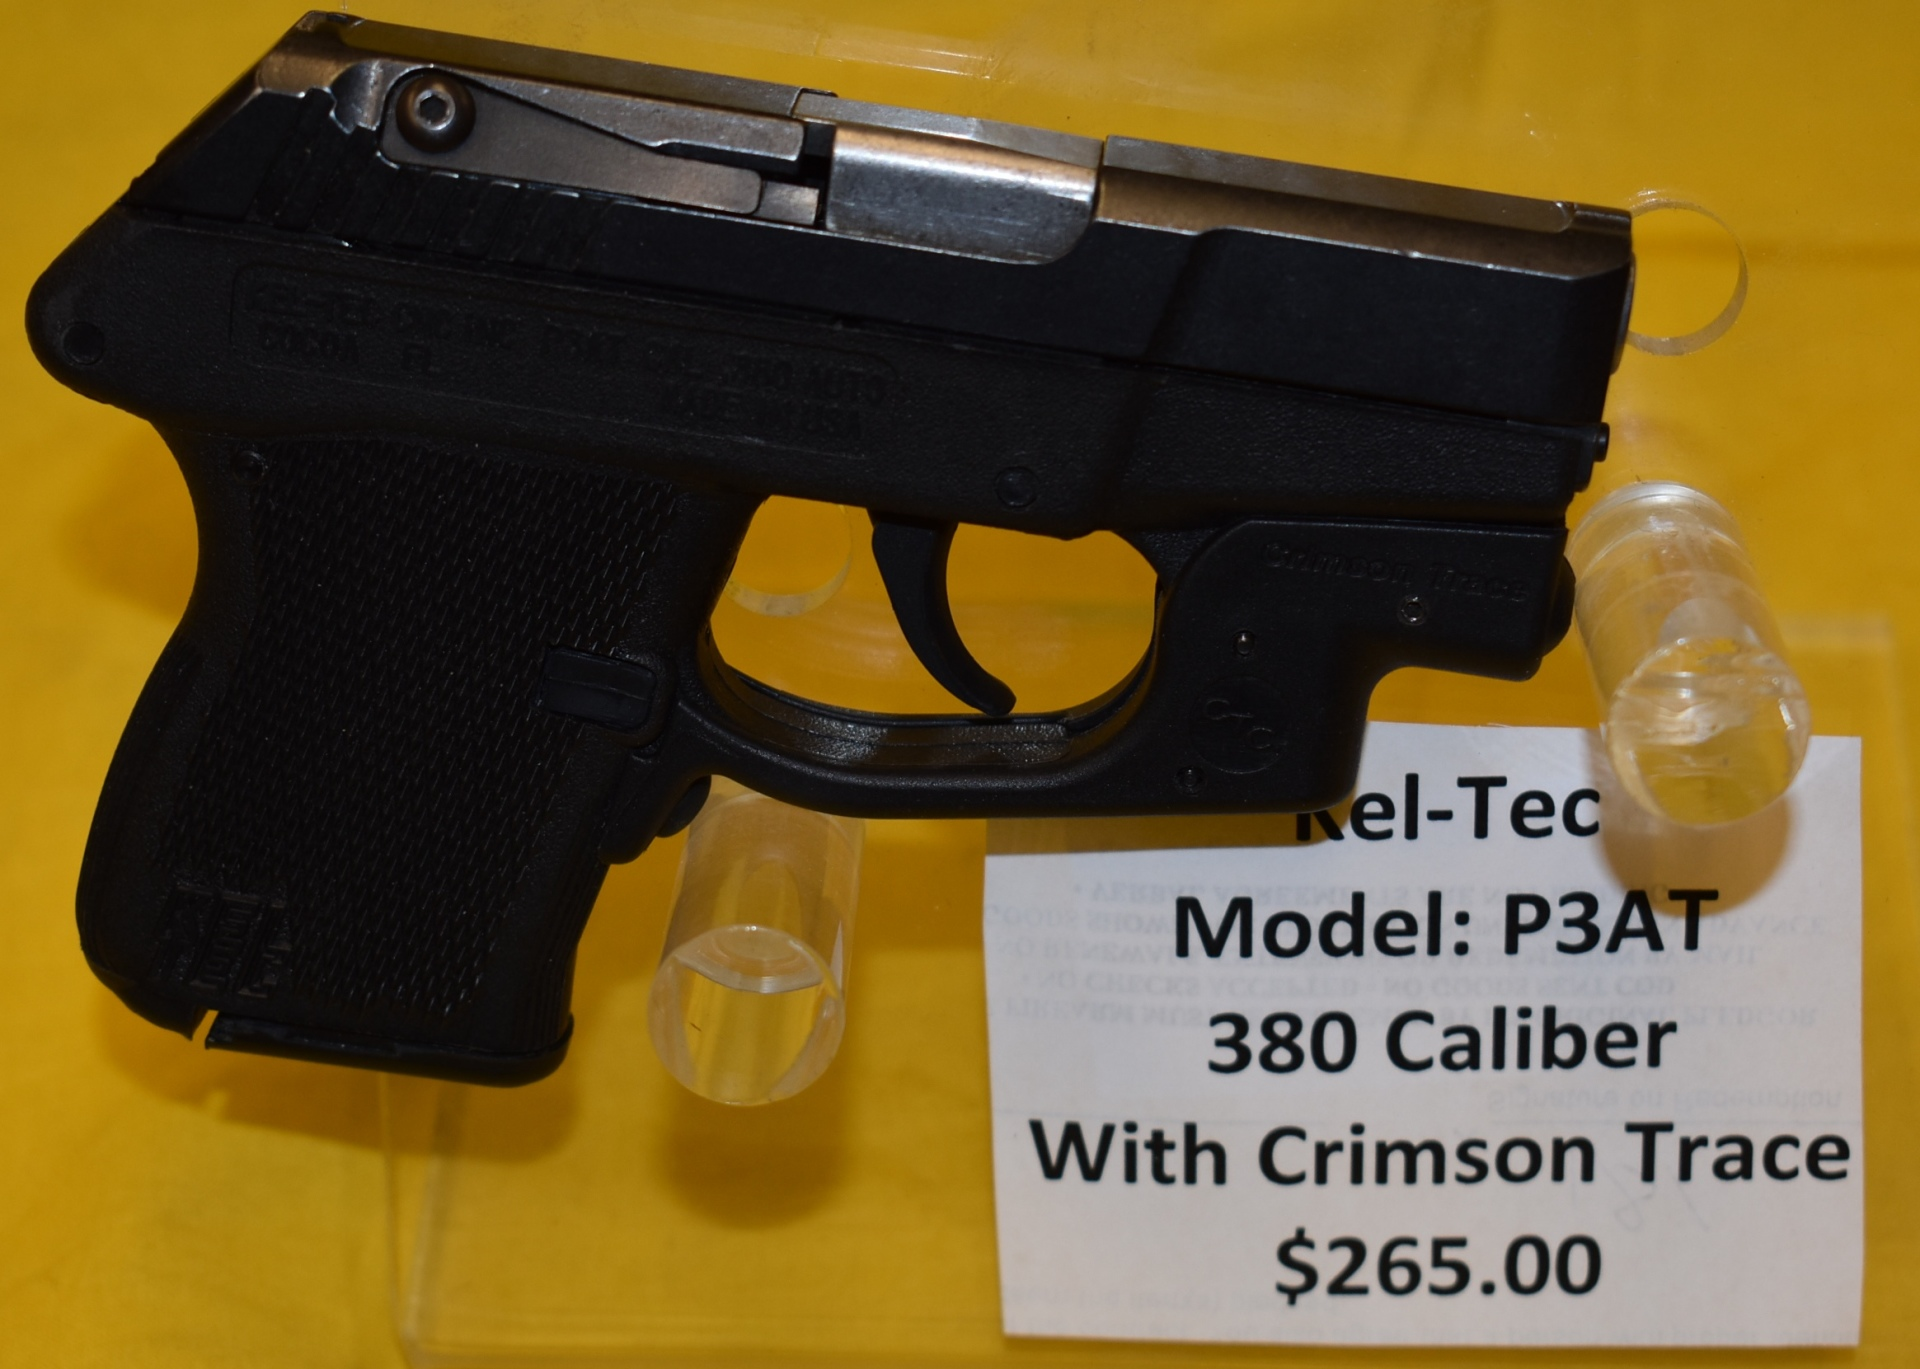 Kel-Tec model P3AT